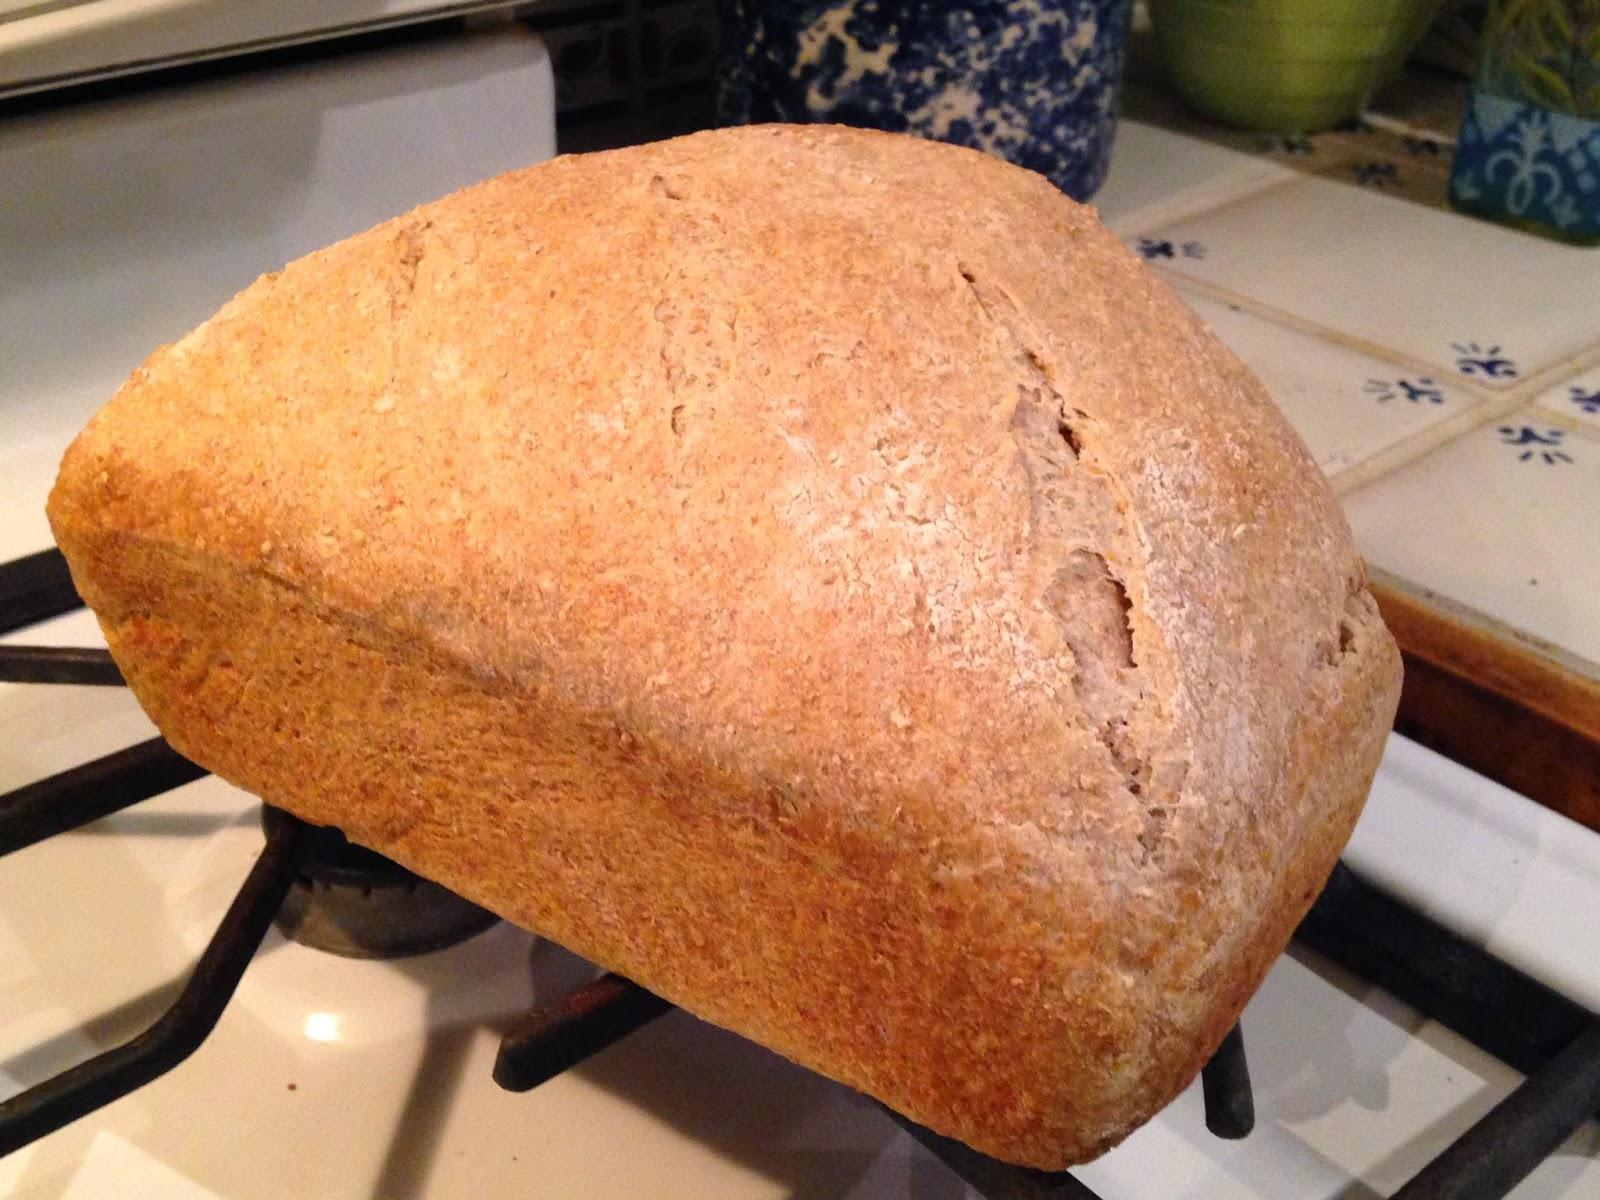 Bread #63: Cornmeal/white good for sandwiches 2